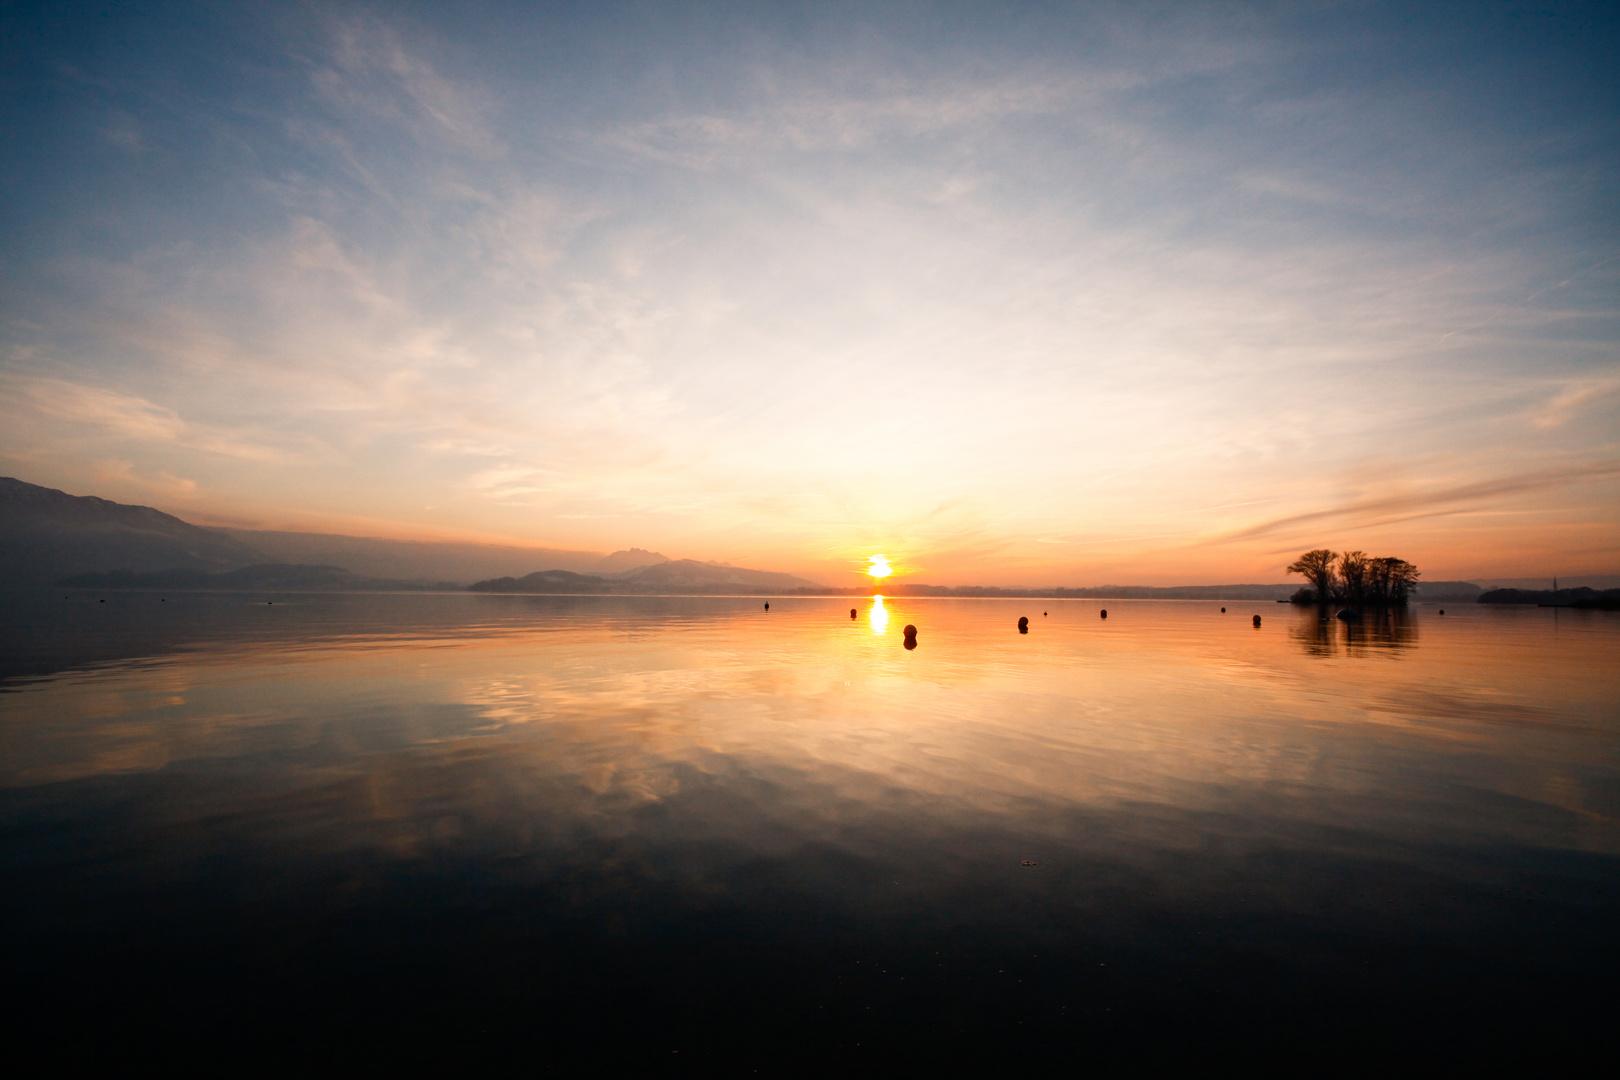 _Sunset_